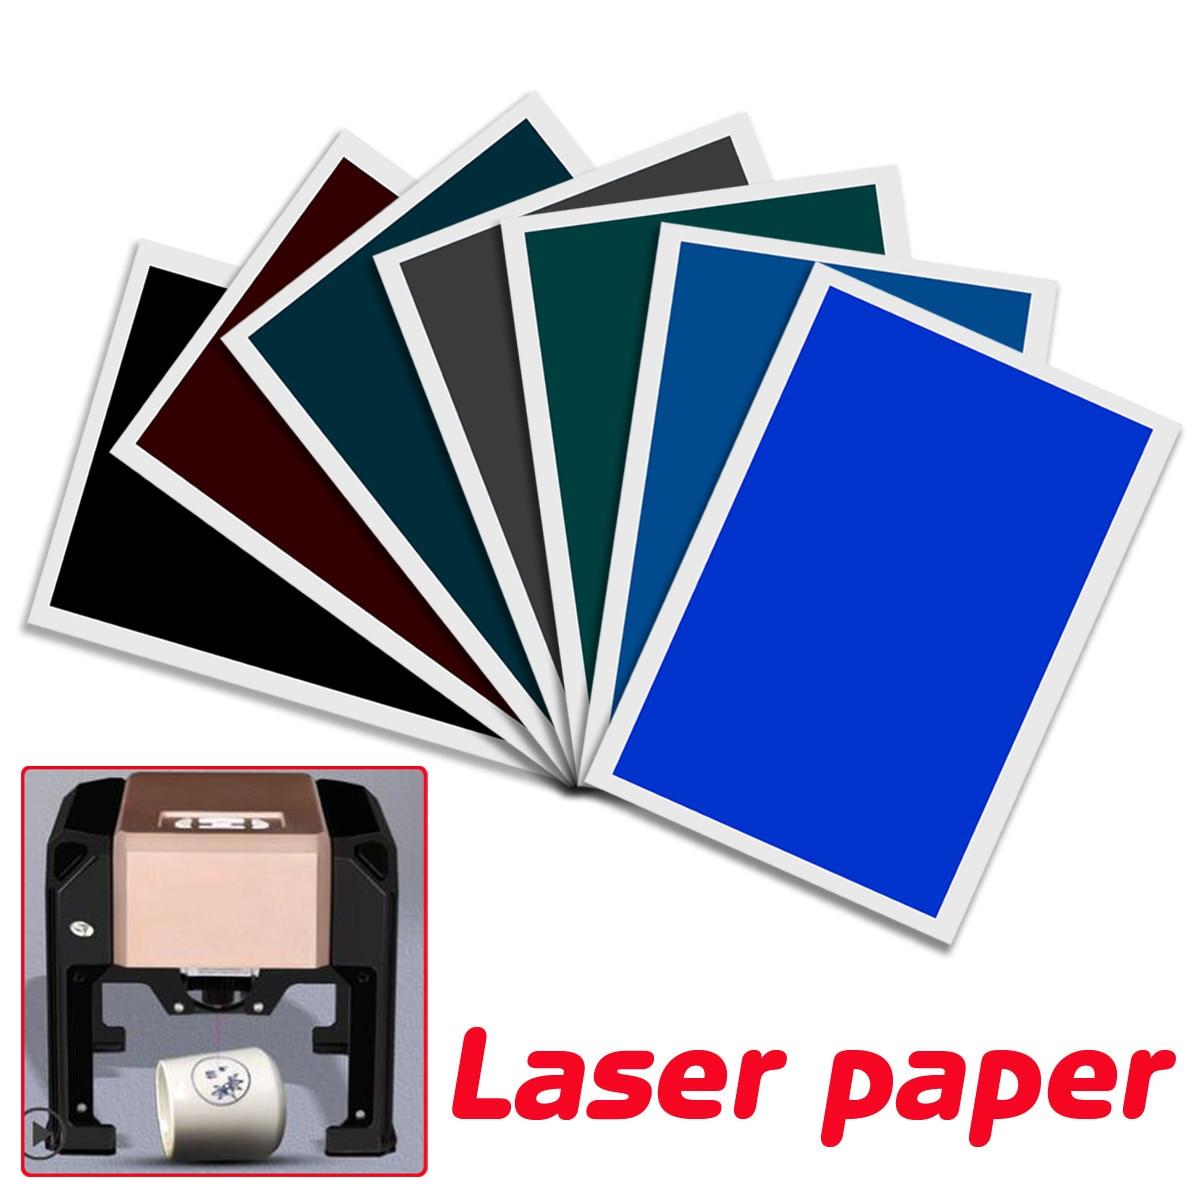 39CM*27CM Black/Gray/Blue/Green/Brown/Blue/Navy Ceramic Laser Paper For CNC Laser Engraving MachineLogo Mark Printer Cutter